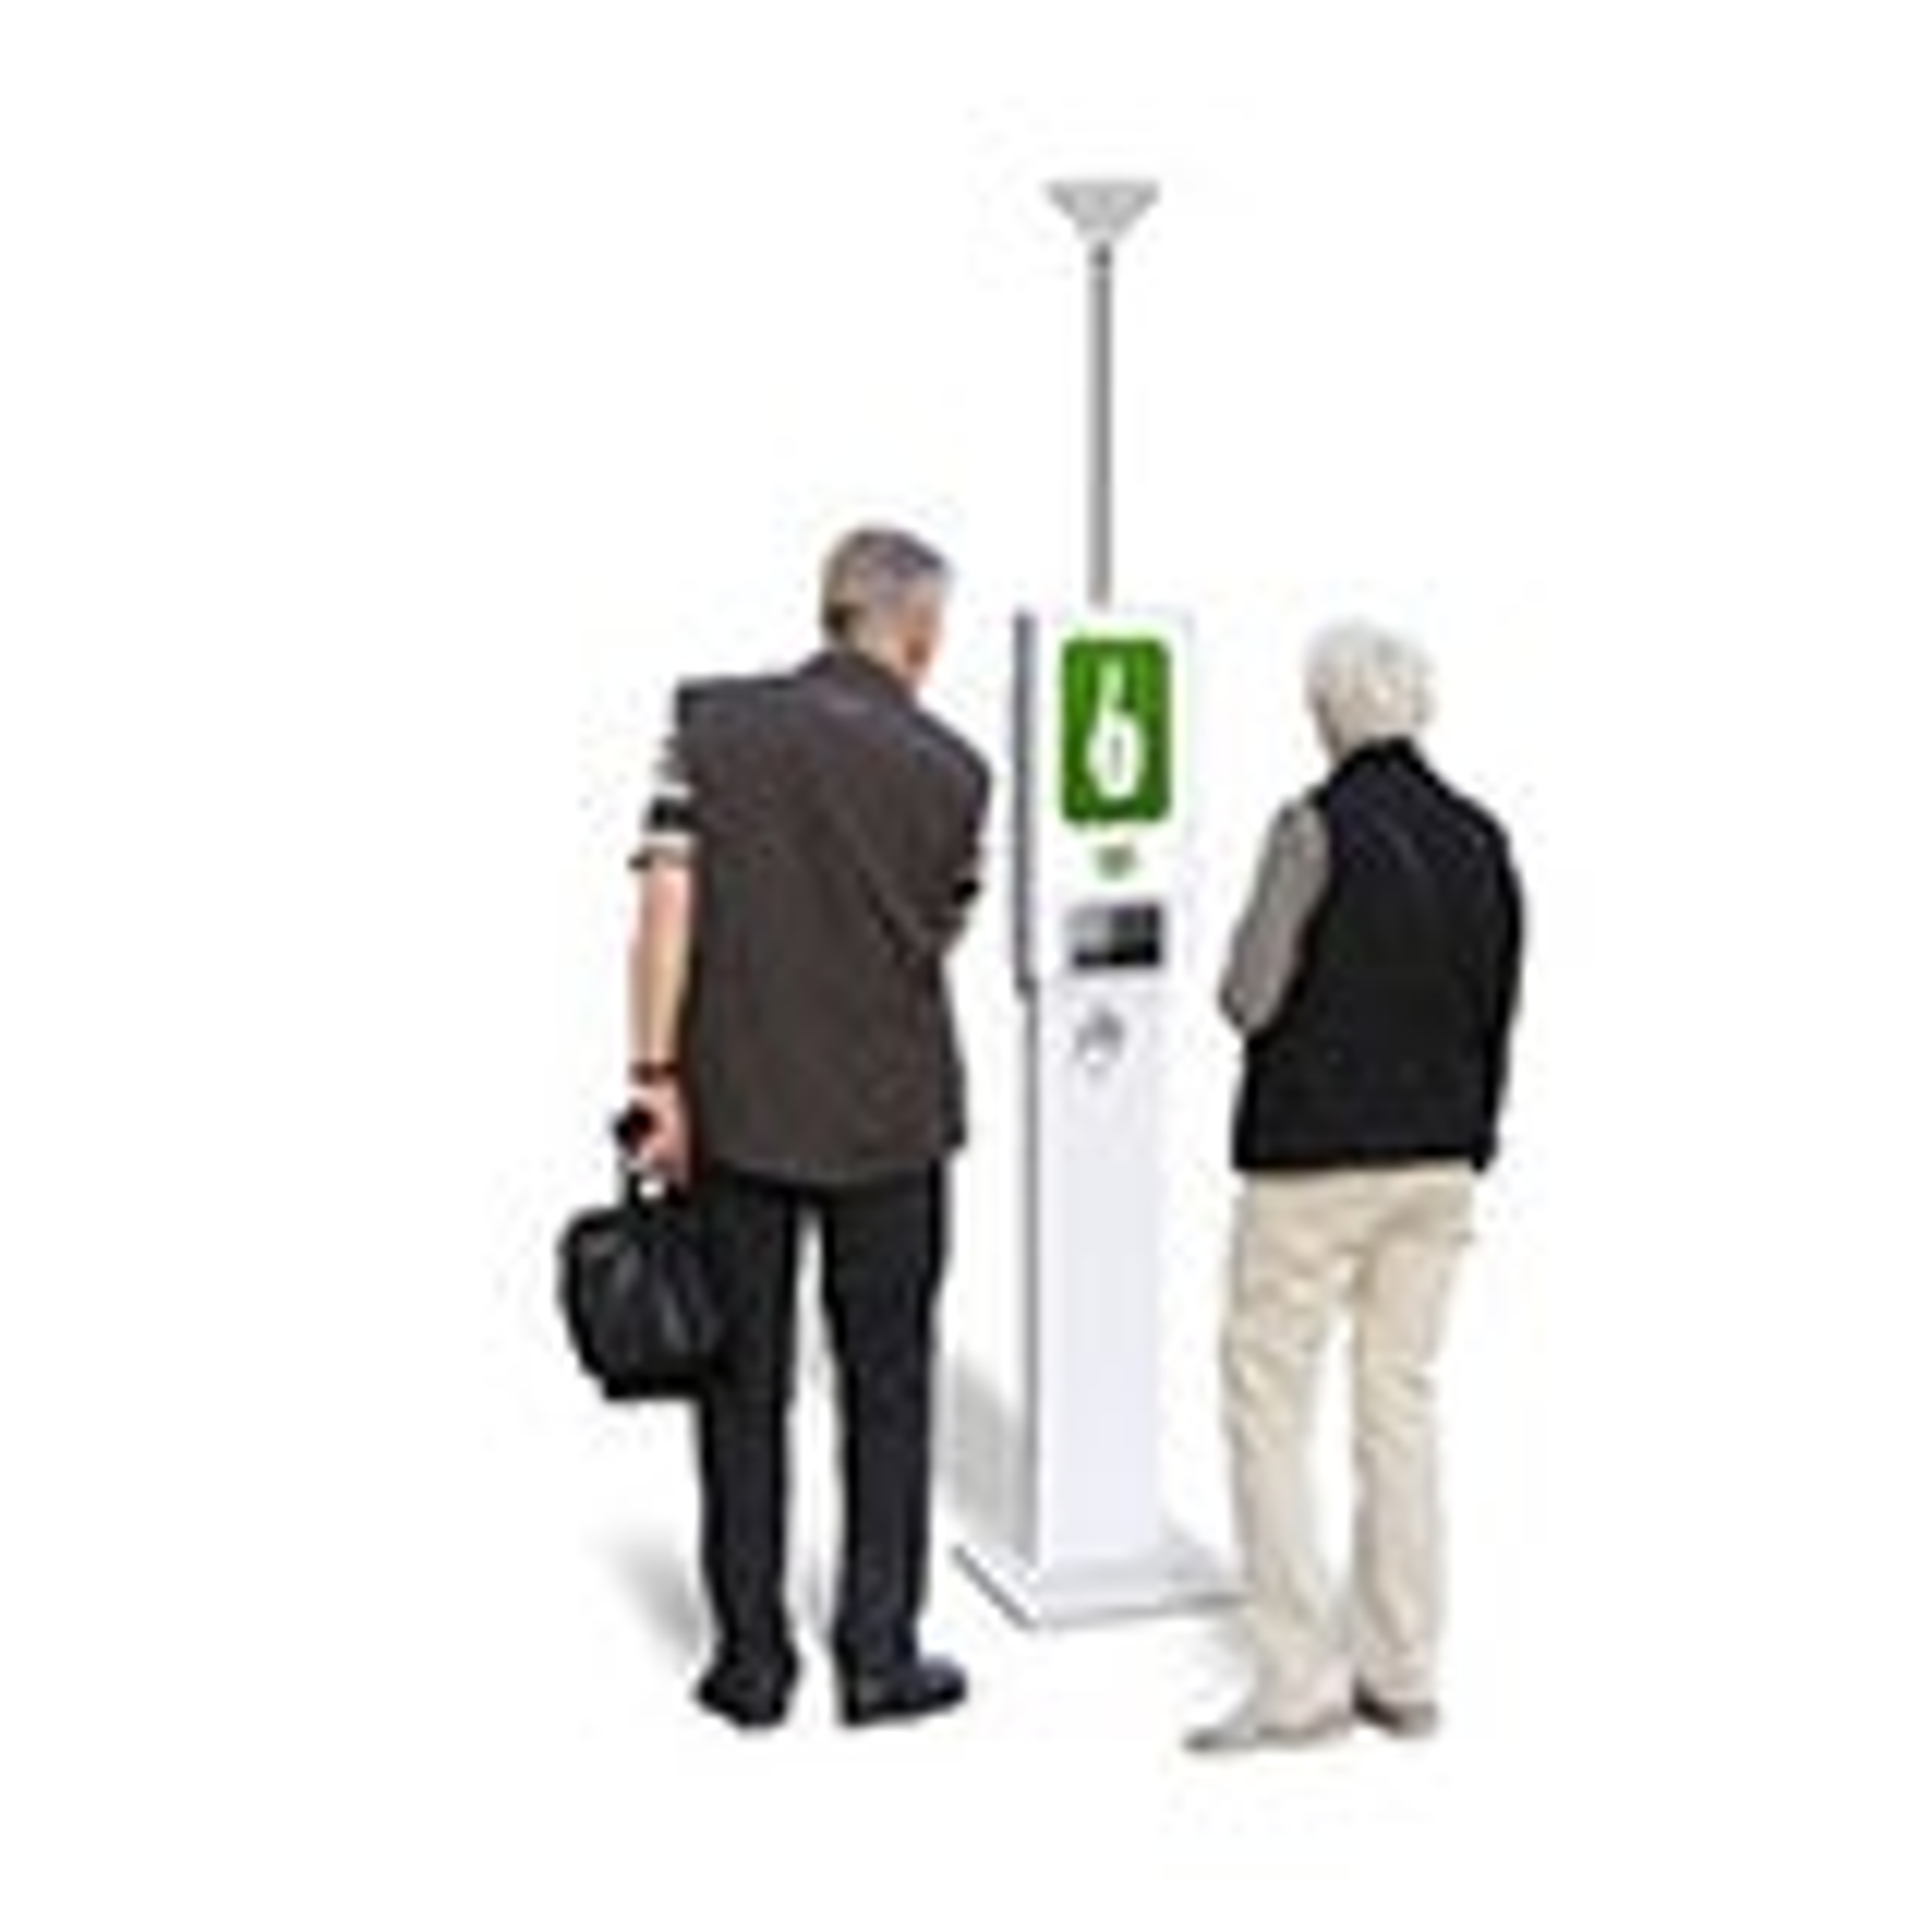 "Axxiv MultiSense Essential Sign 22"" digitale Werbe-/Informations-Stele"